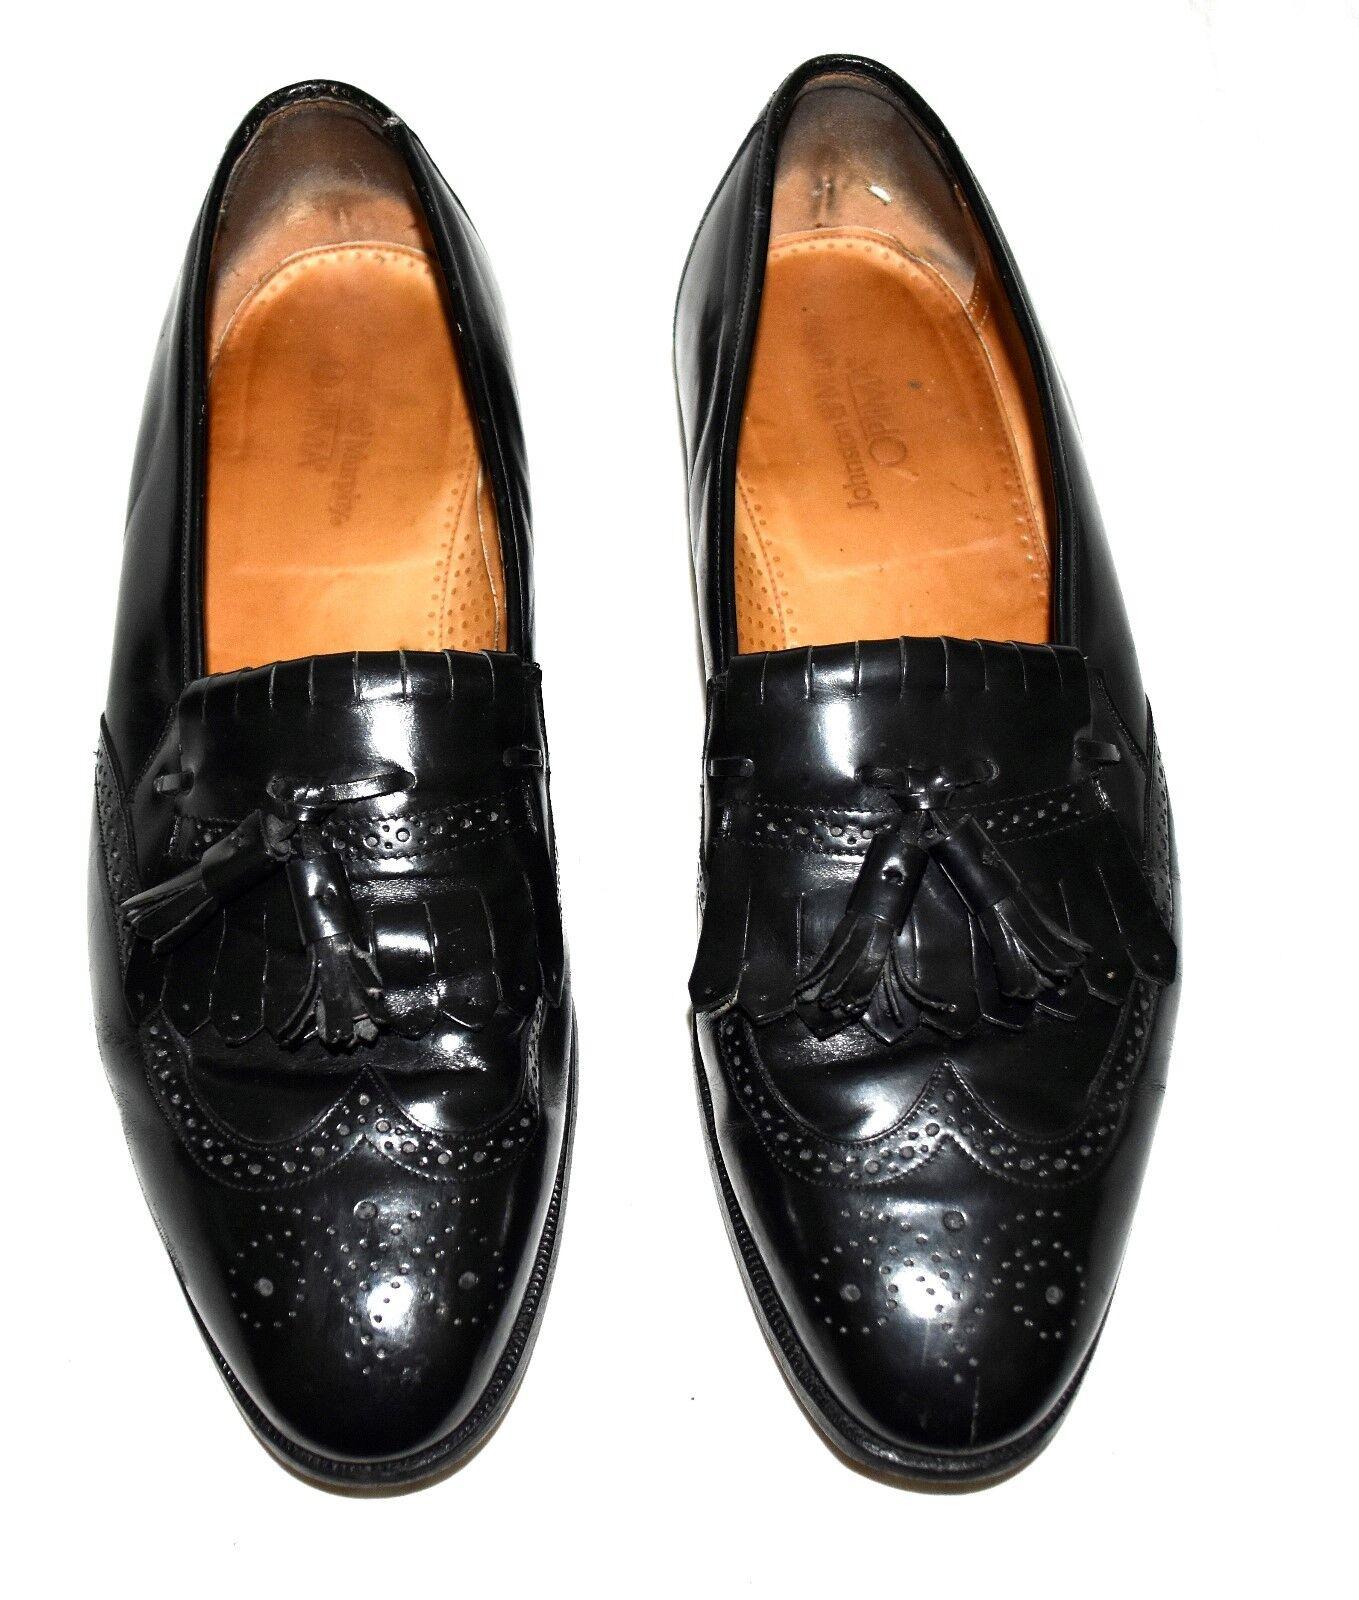 Johnston & Murphy Optima Black Kilt Fringe &Tassels Leather Mens Loafers Sz 12 D